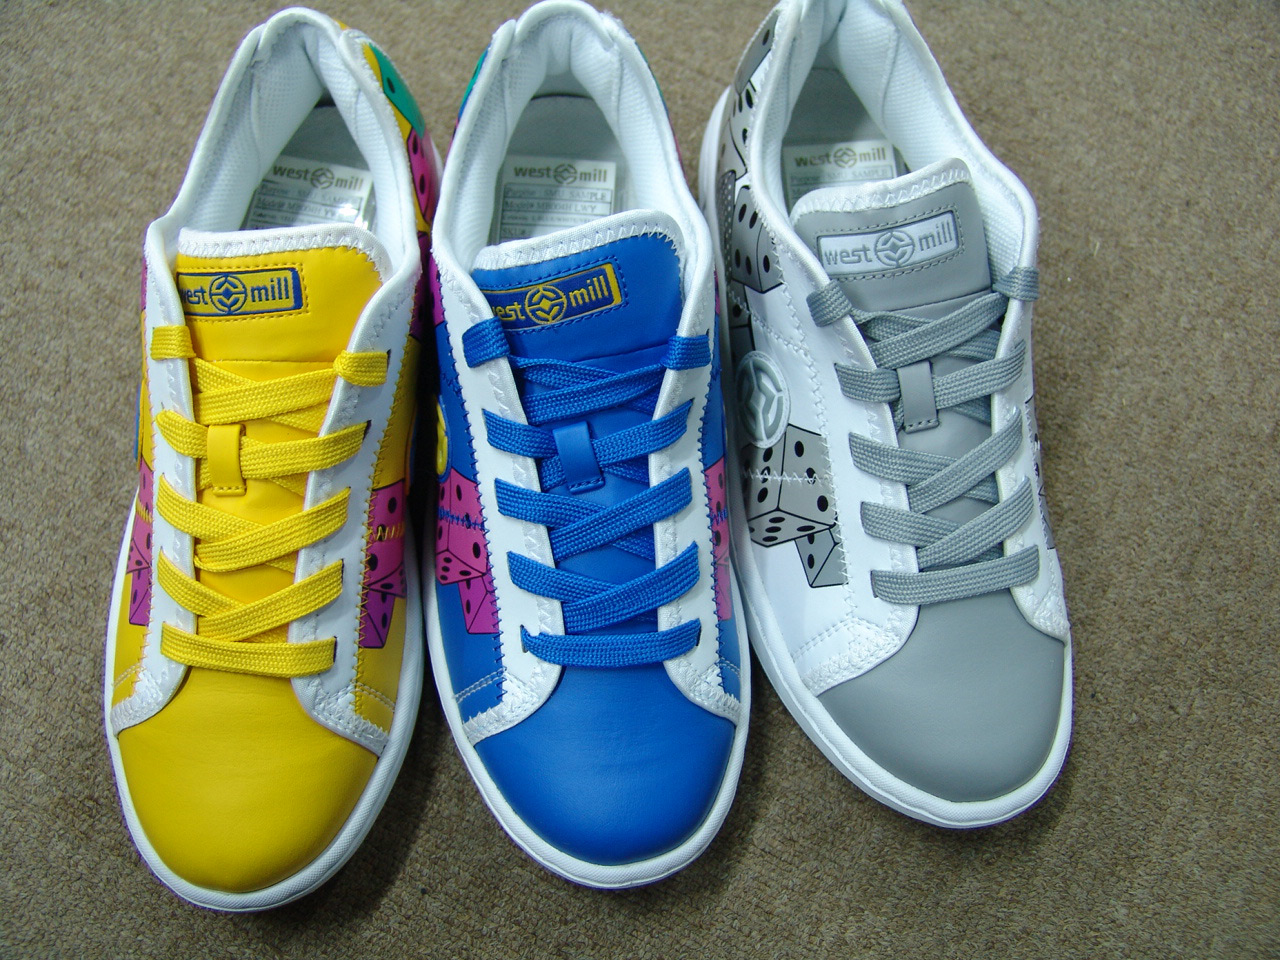 dice-sneaker-product.jpg